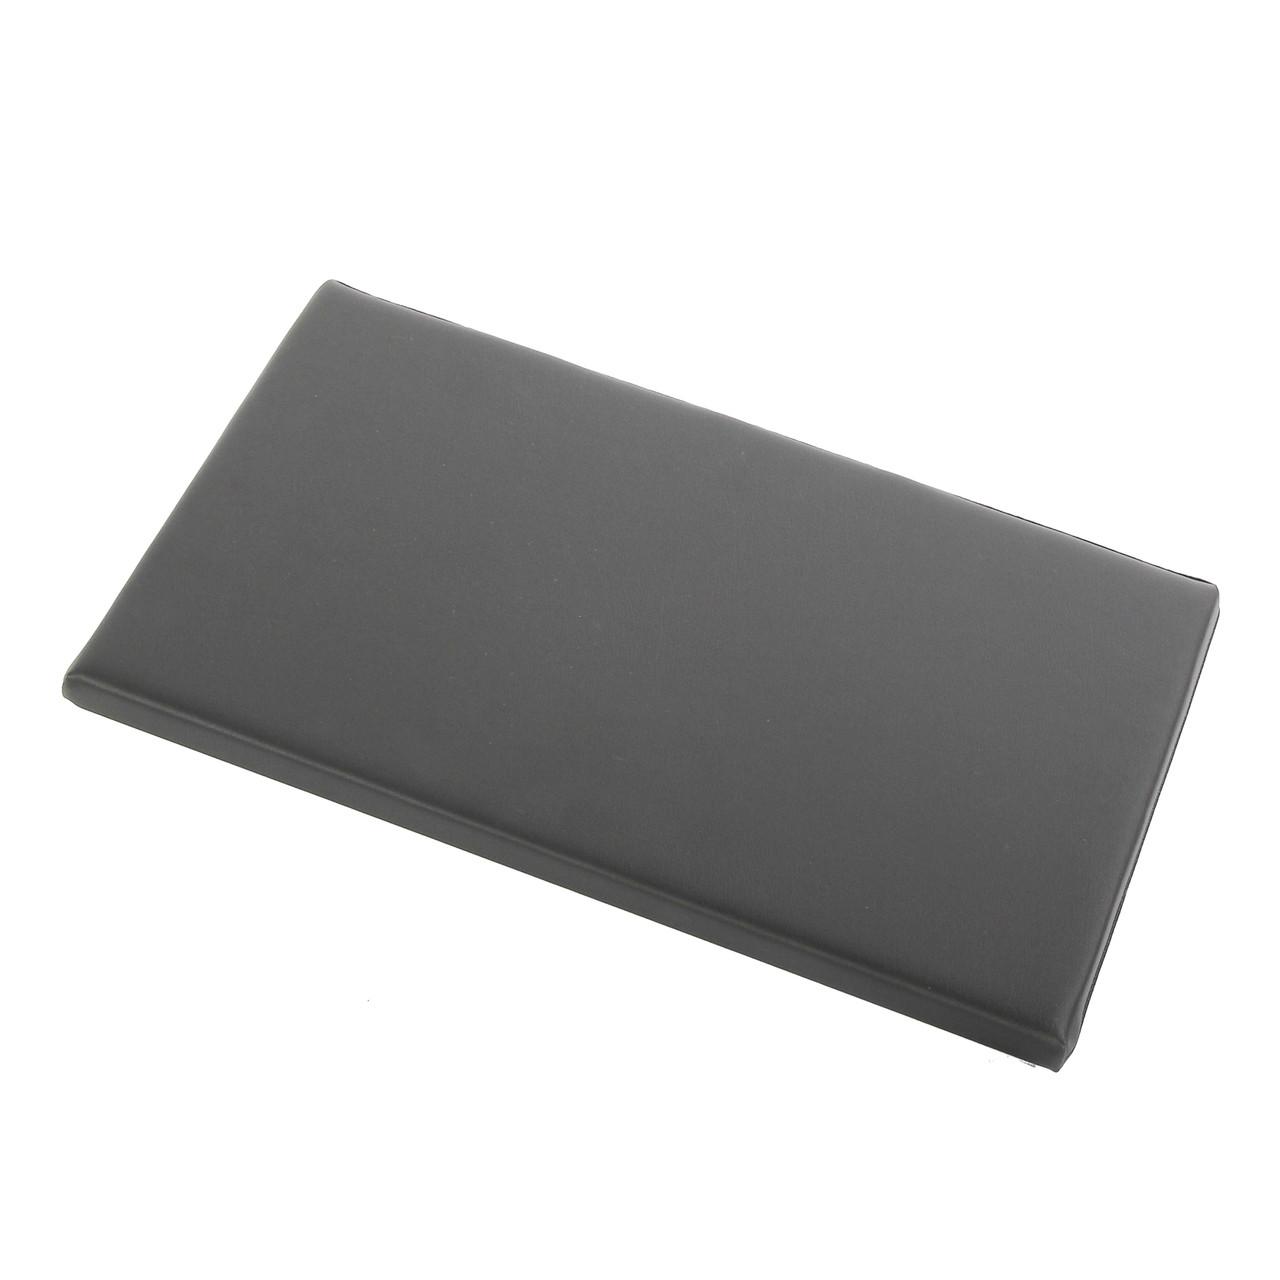 Flat Foot Plate